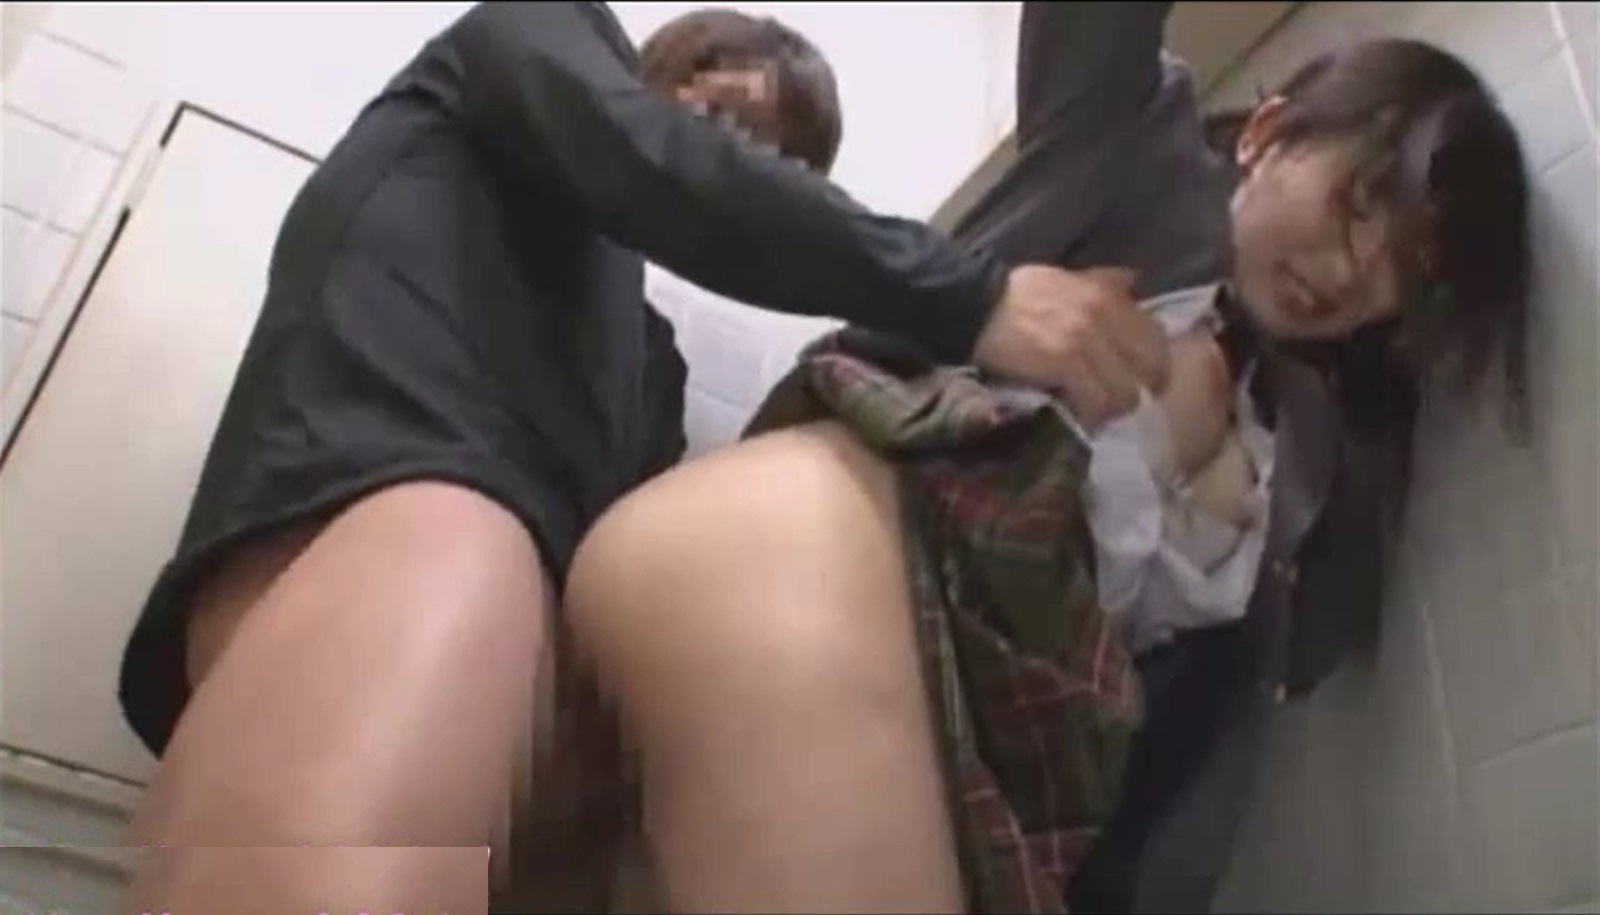 【※JKレイプ※】女子トイレで美少女JKを襲う!怯えるJKのアナルに生挿入し犯し尽す…!